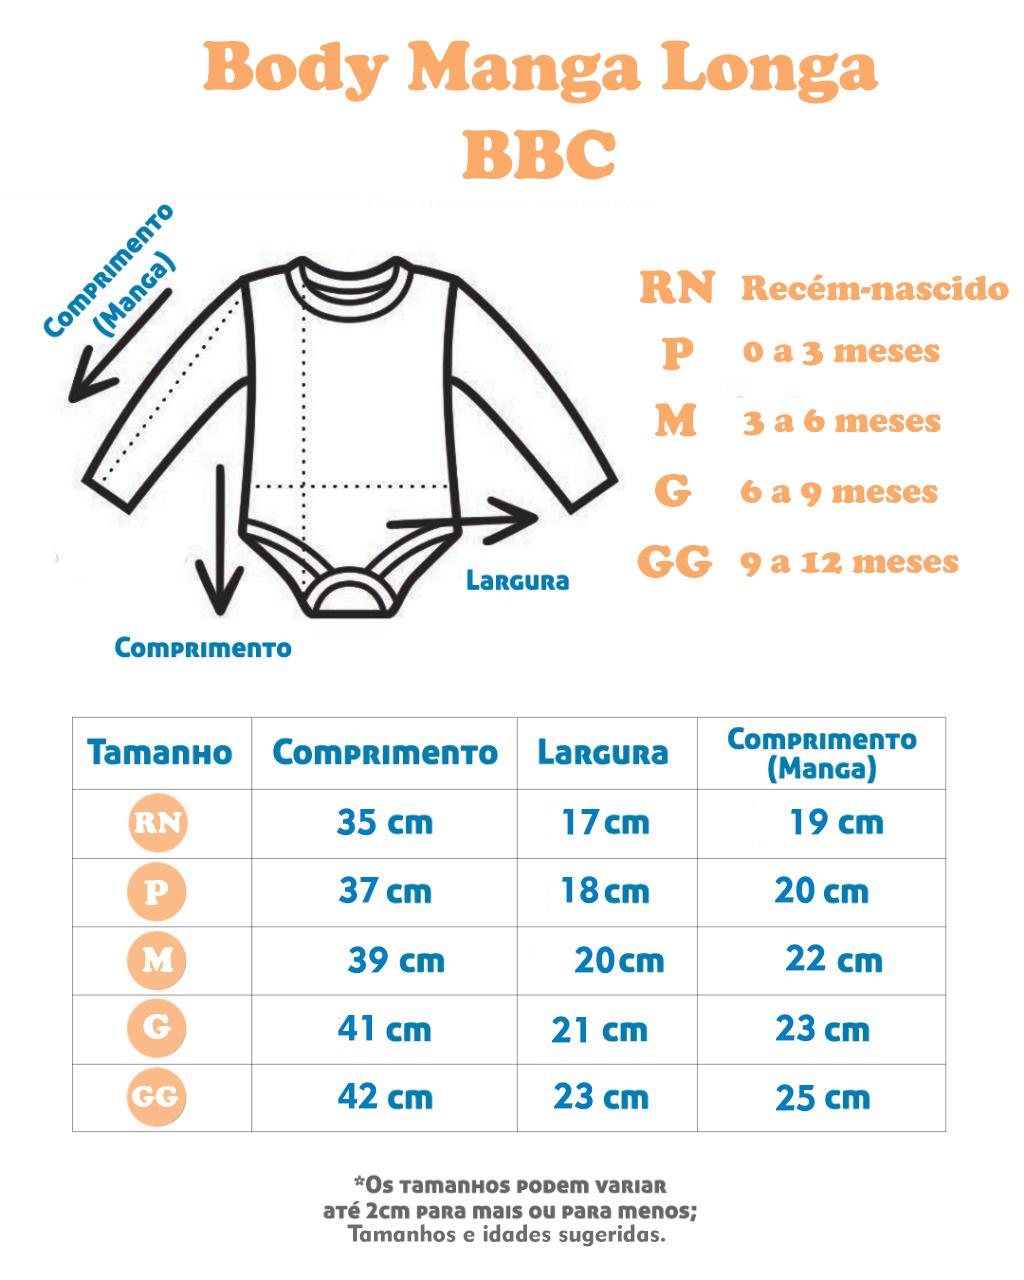 Body Manga Longa Rosa Liso (RN/P/M/G/GG)